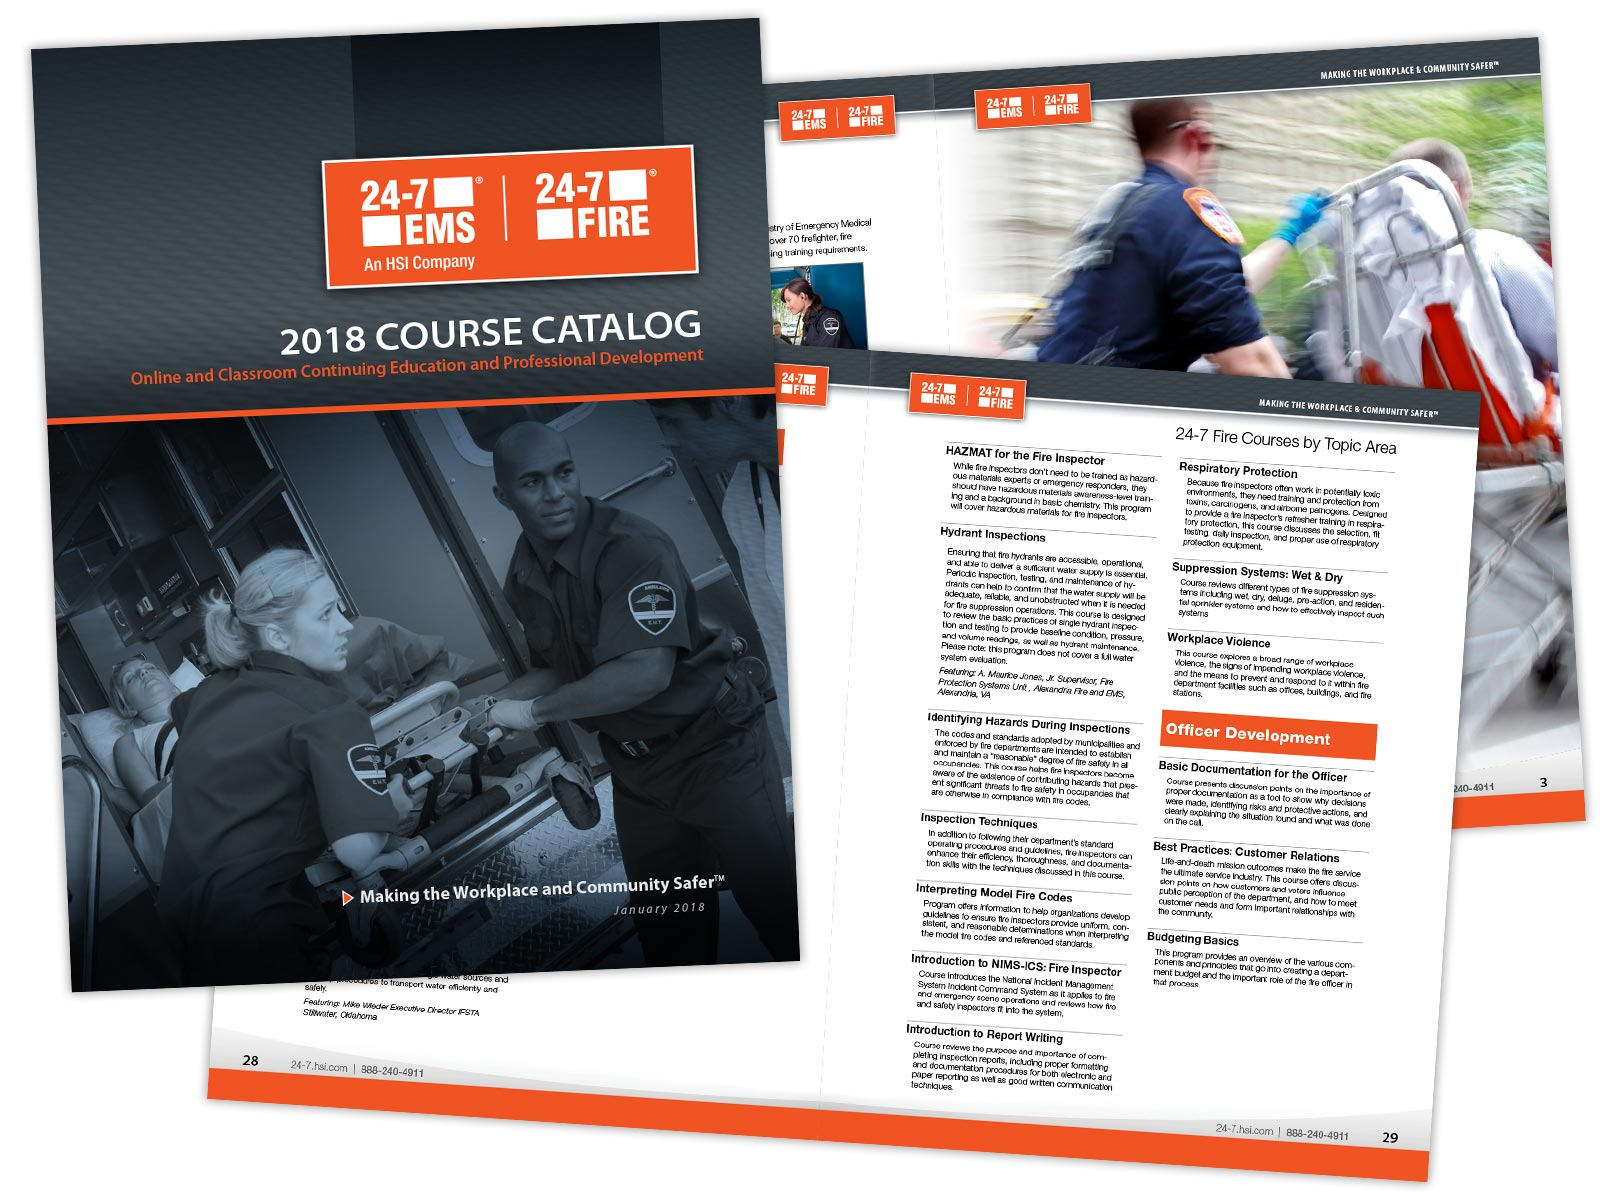 24-7 Course Catalog